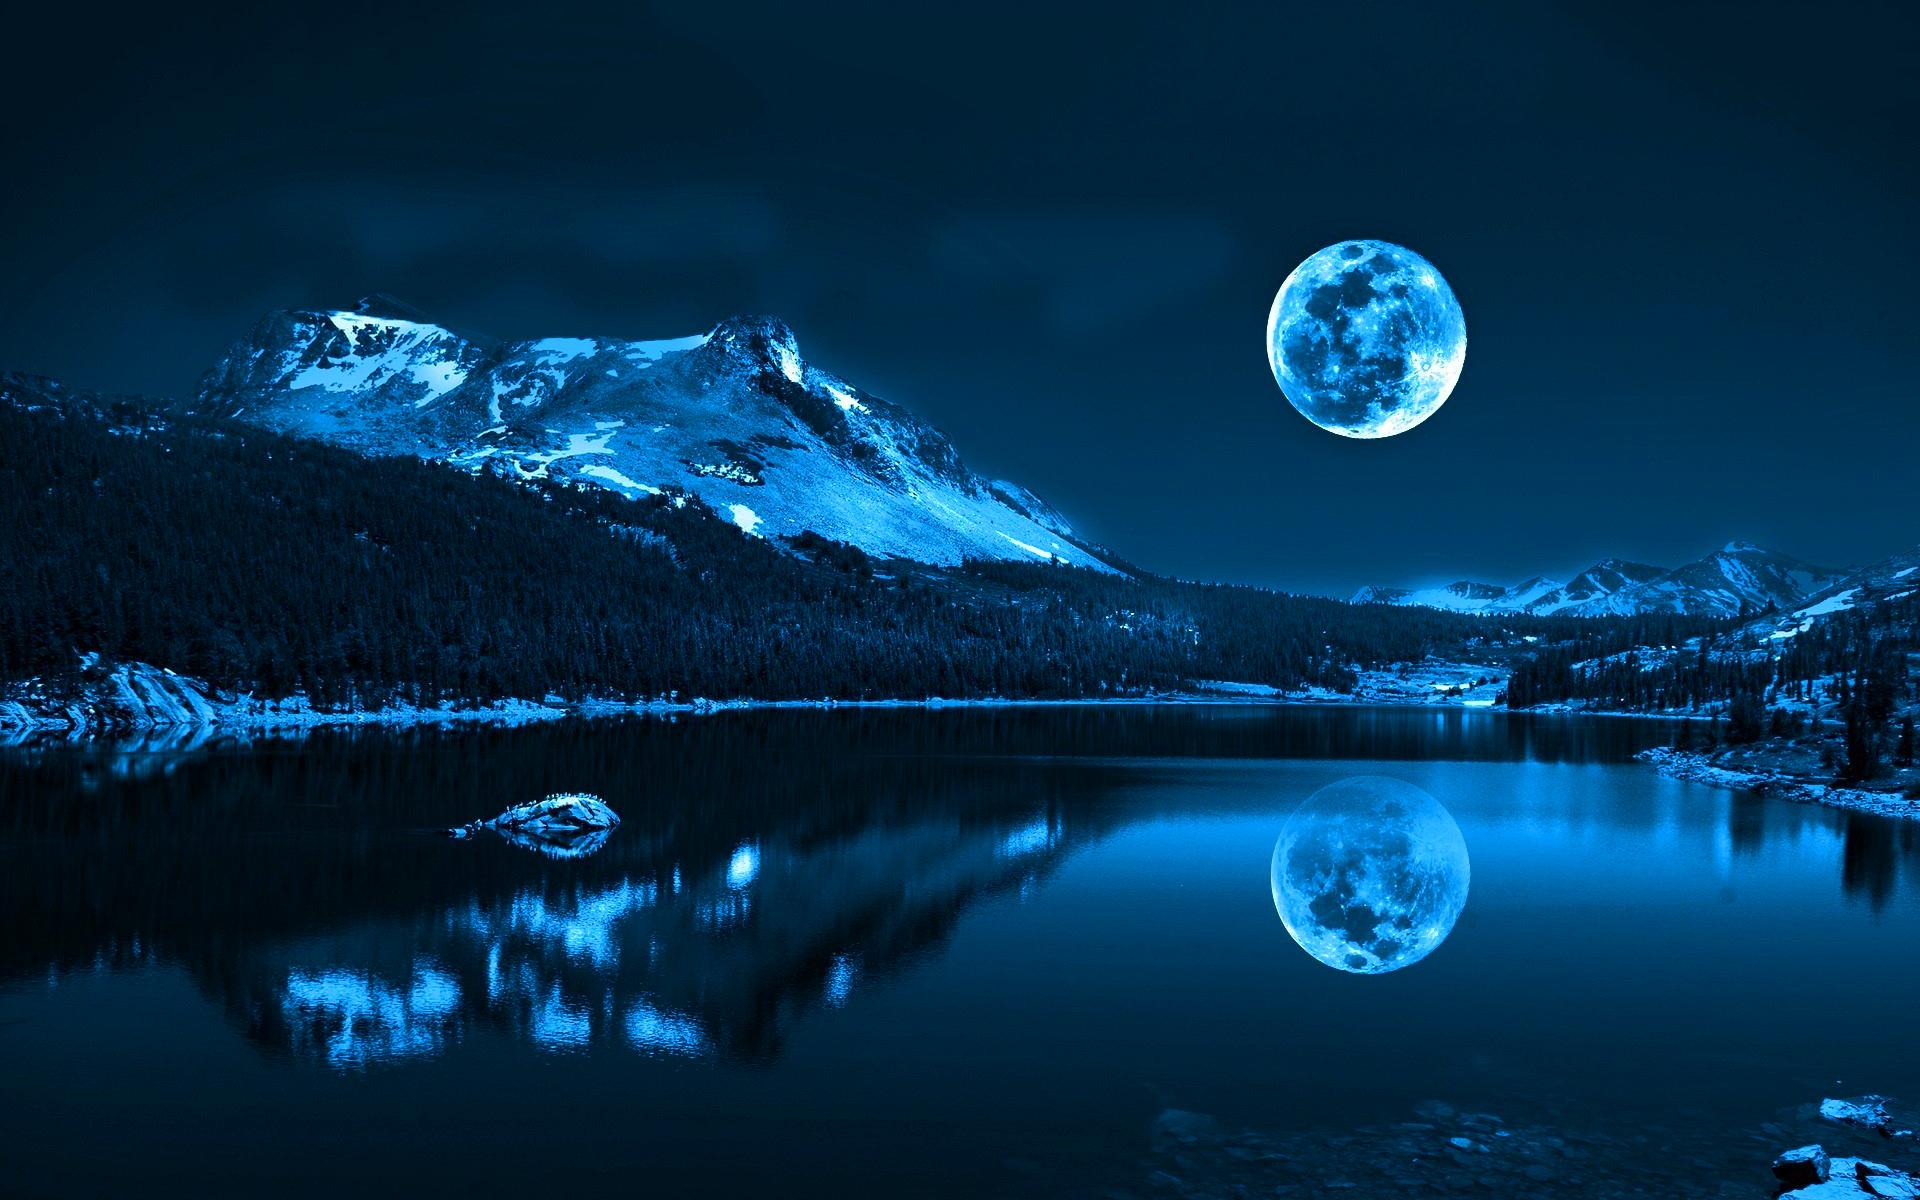 full-moon-over-lake-1920x1200